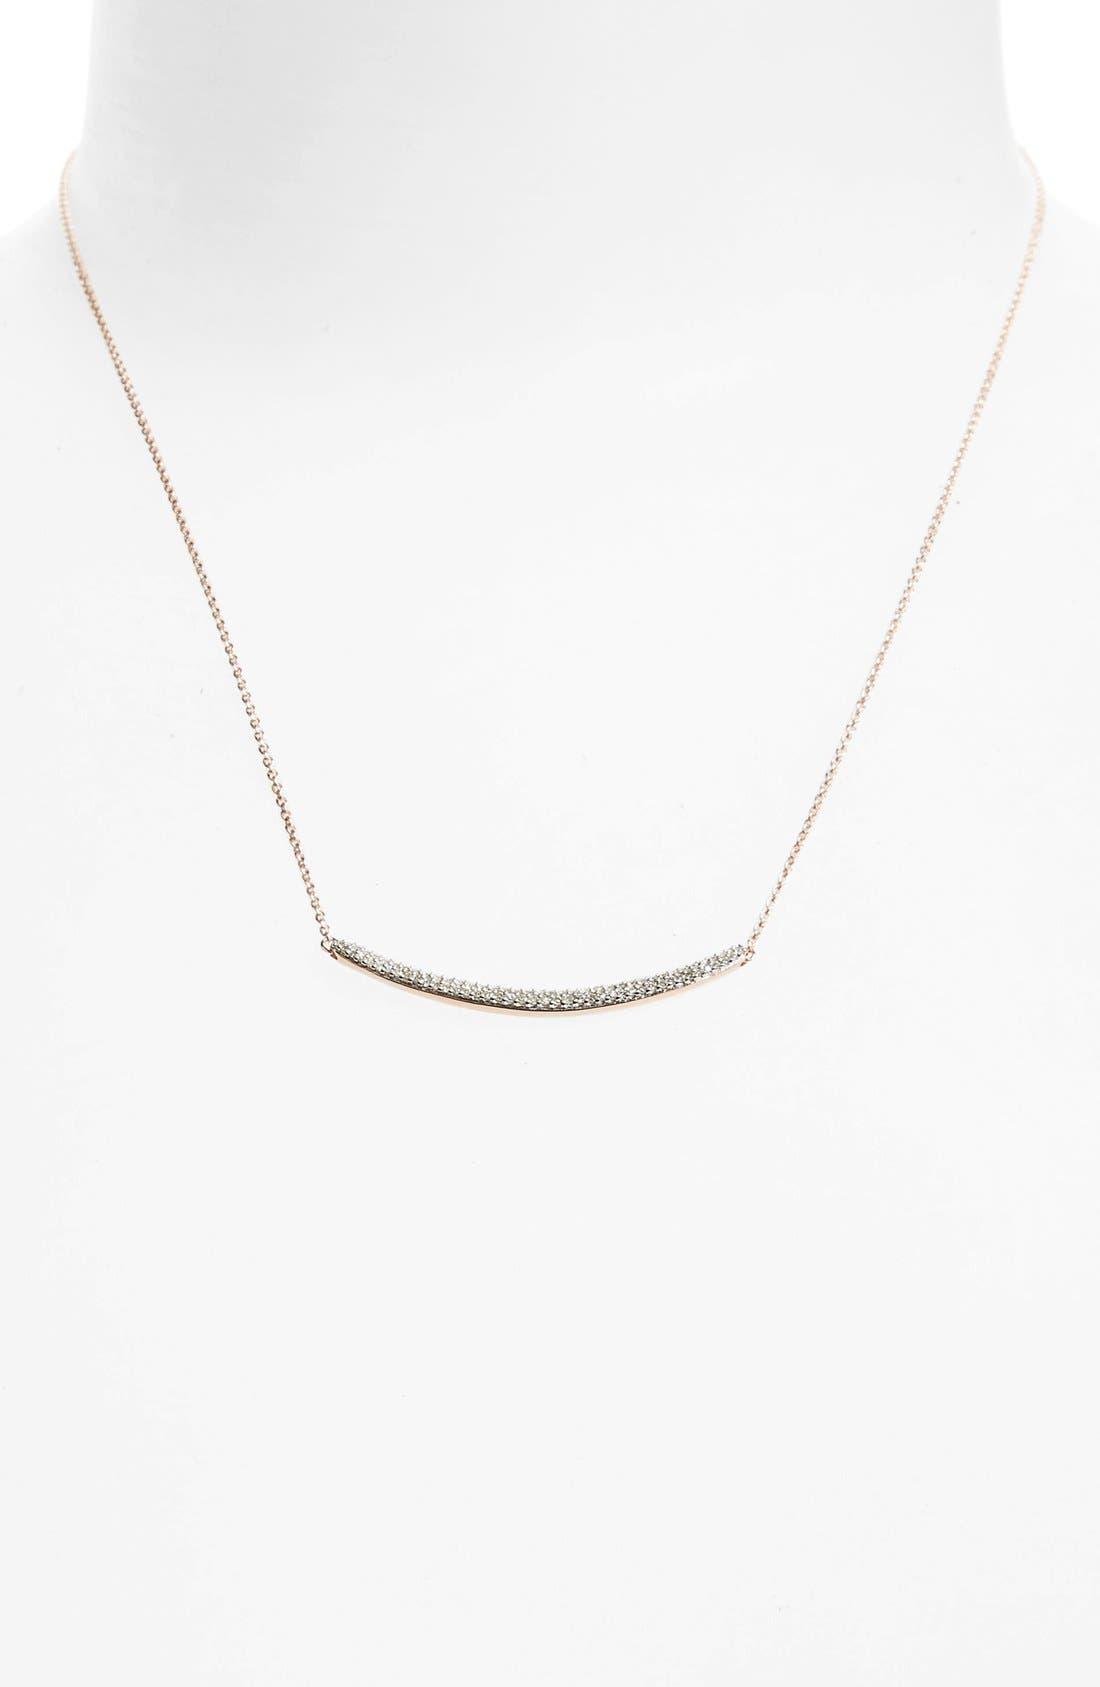 MONICA VINADER, Skinny Diamond Necklace, Alternate thumbnail 5, color, ROSE GOLD